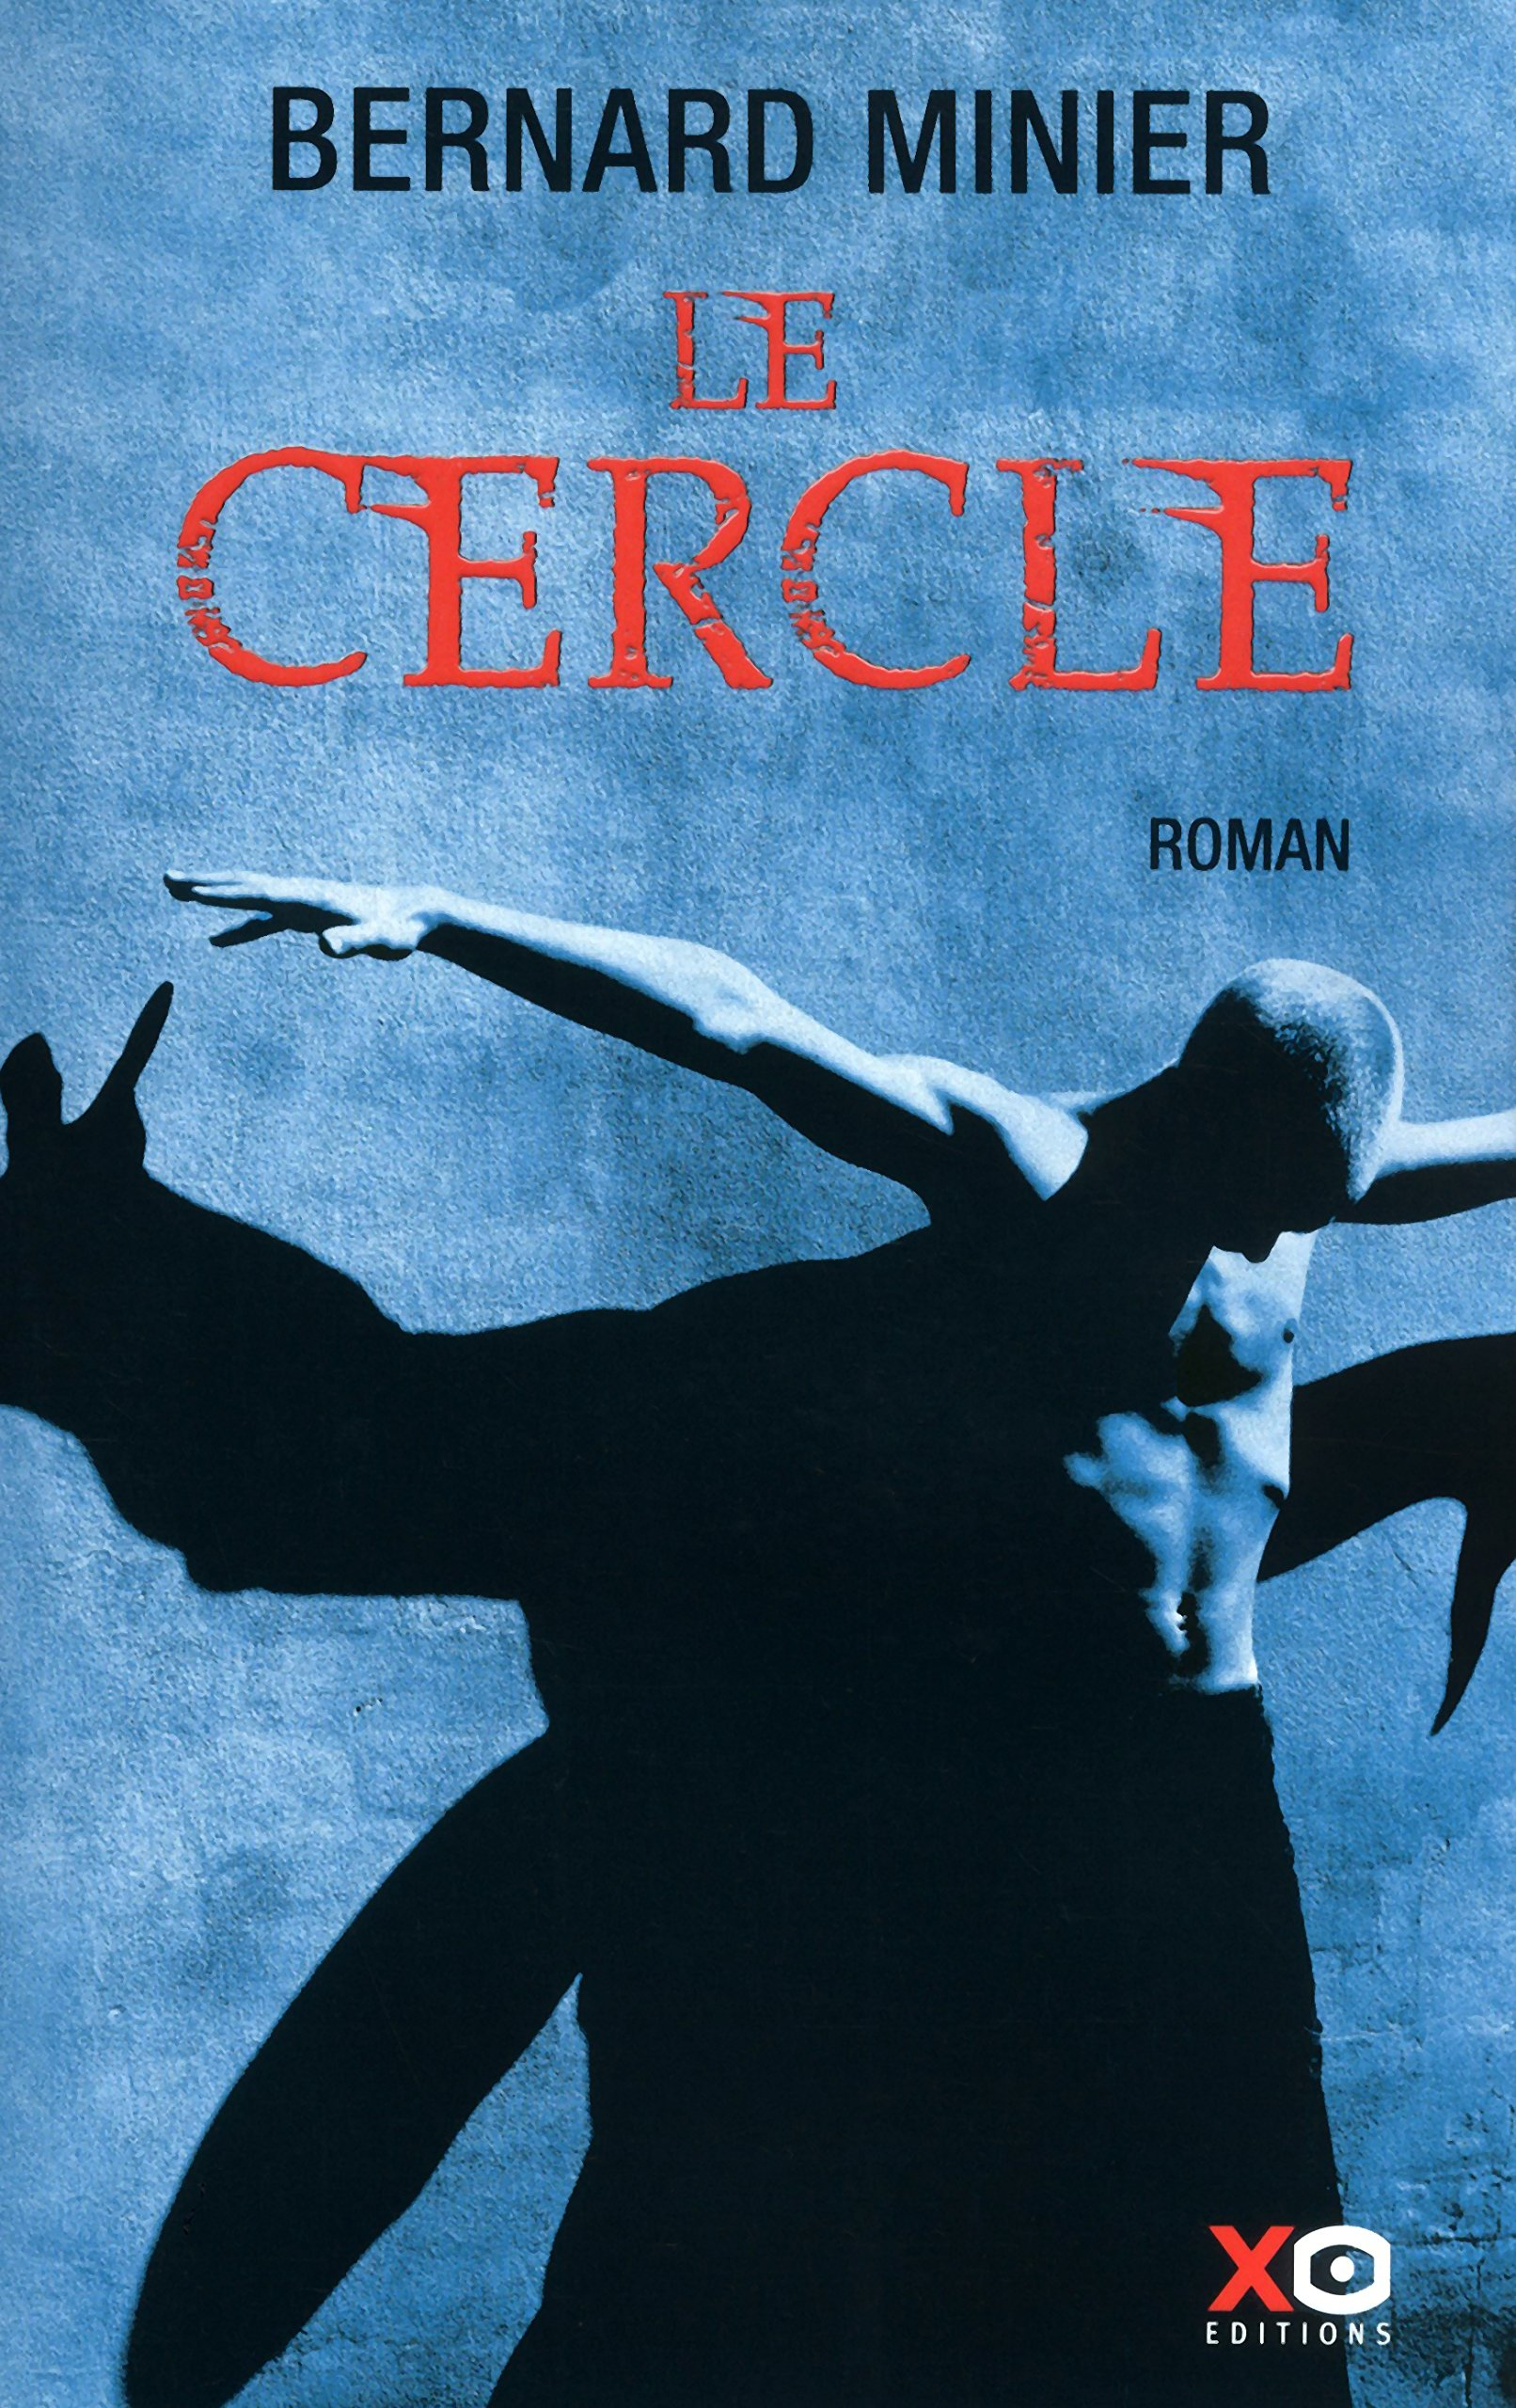 Le Cercle Bernard Minier 9782845635562 Amazon Com Books